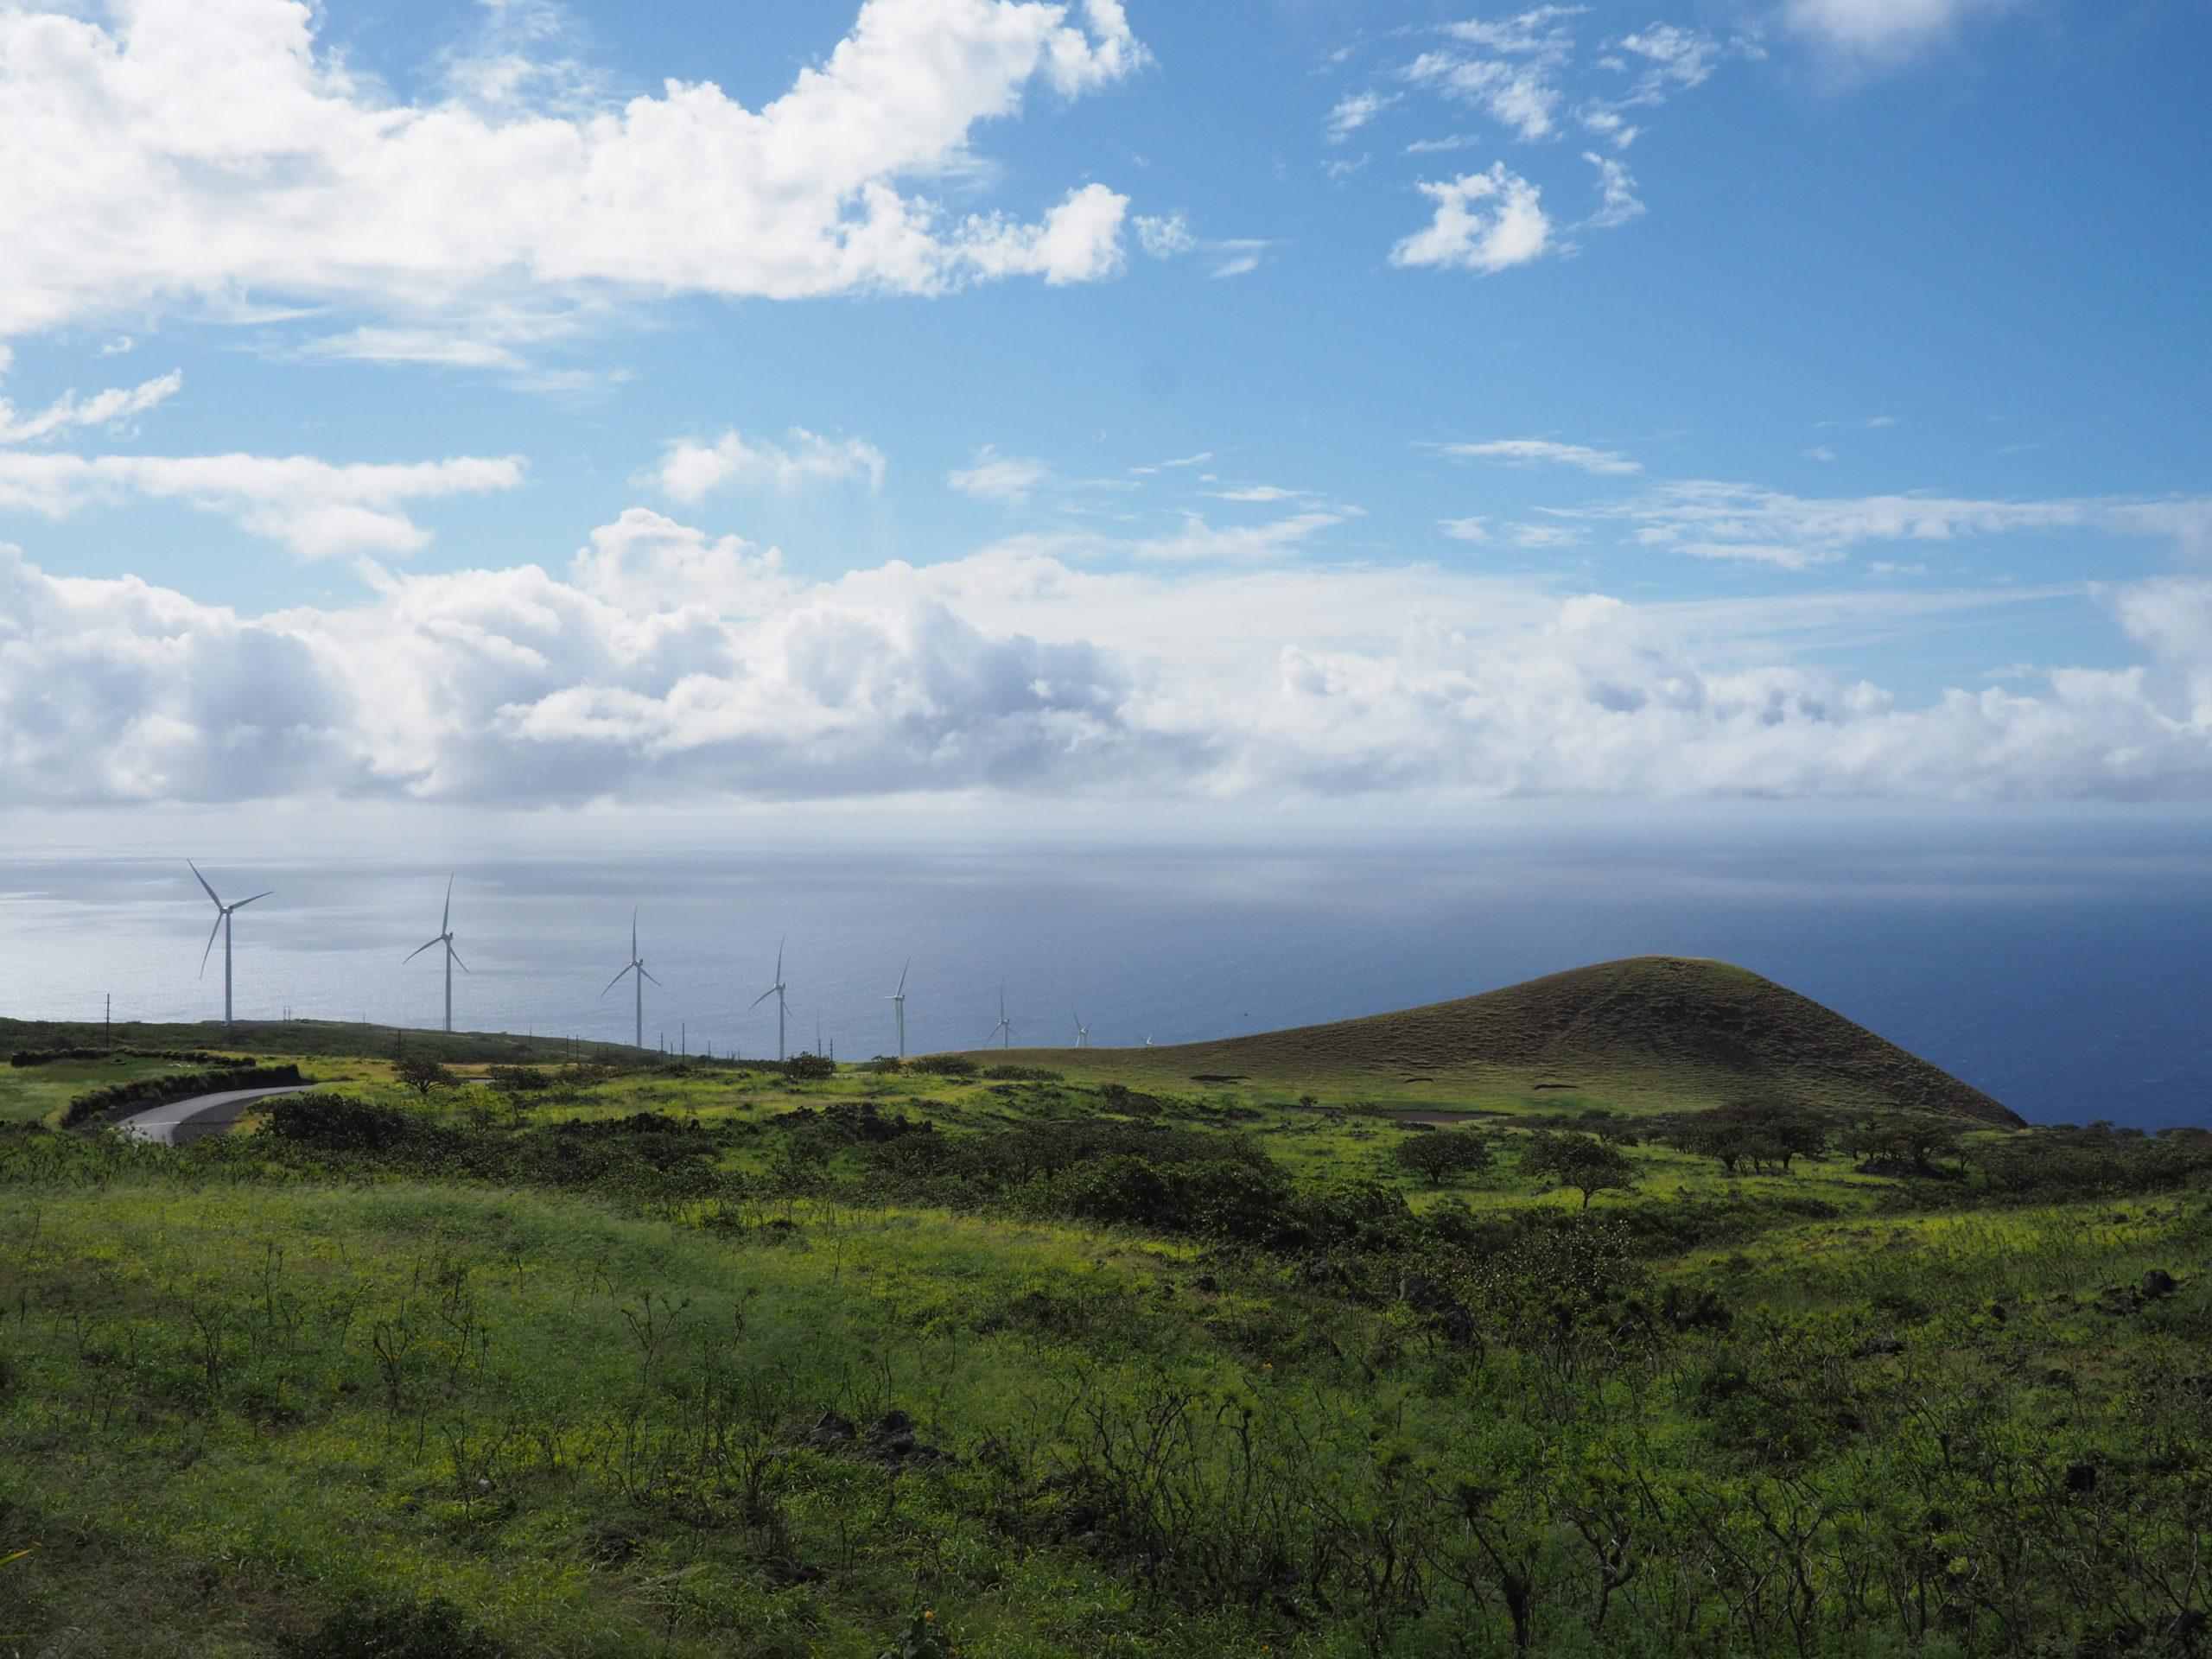 Auwahi Wind Energy Hybrid